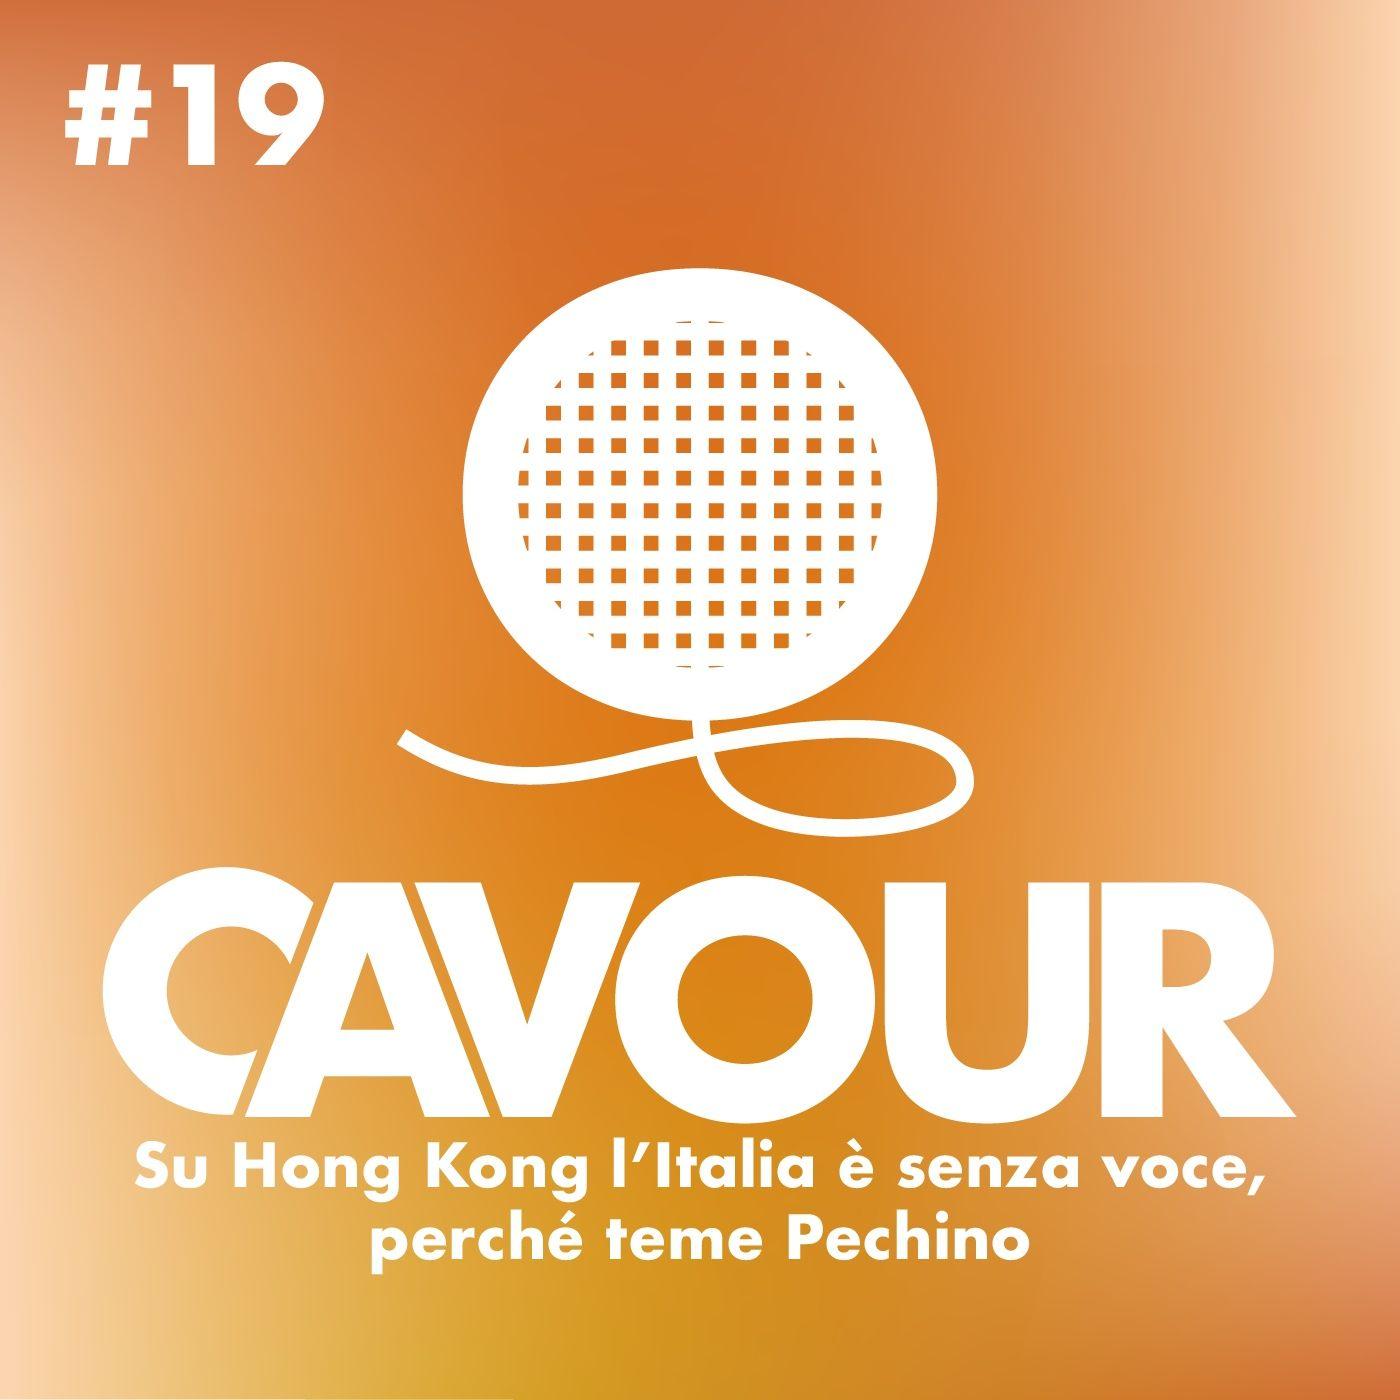 Su Hong Kong l'Italia è senza voce, perché teme Pechino #19